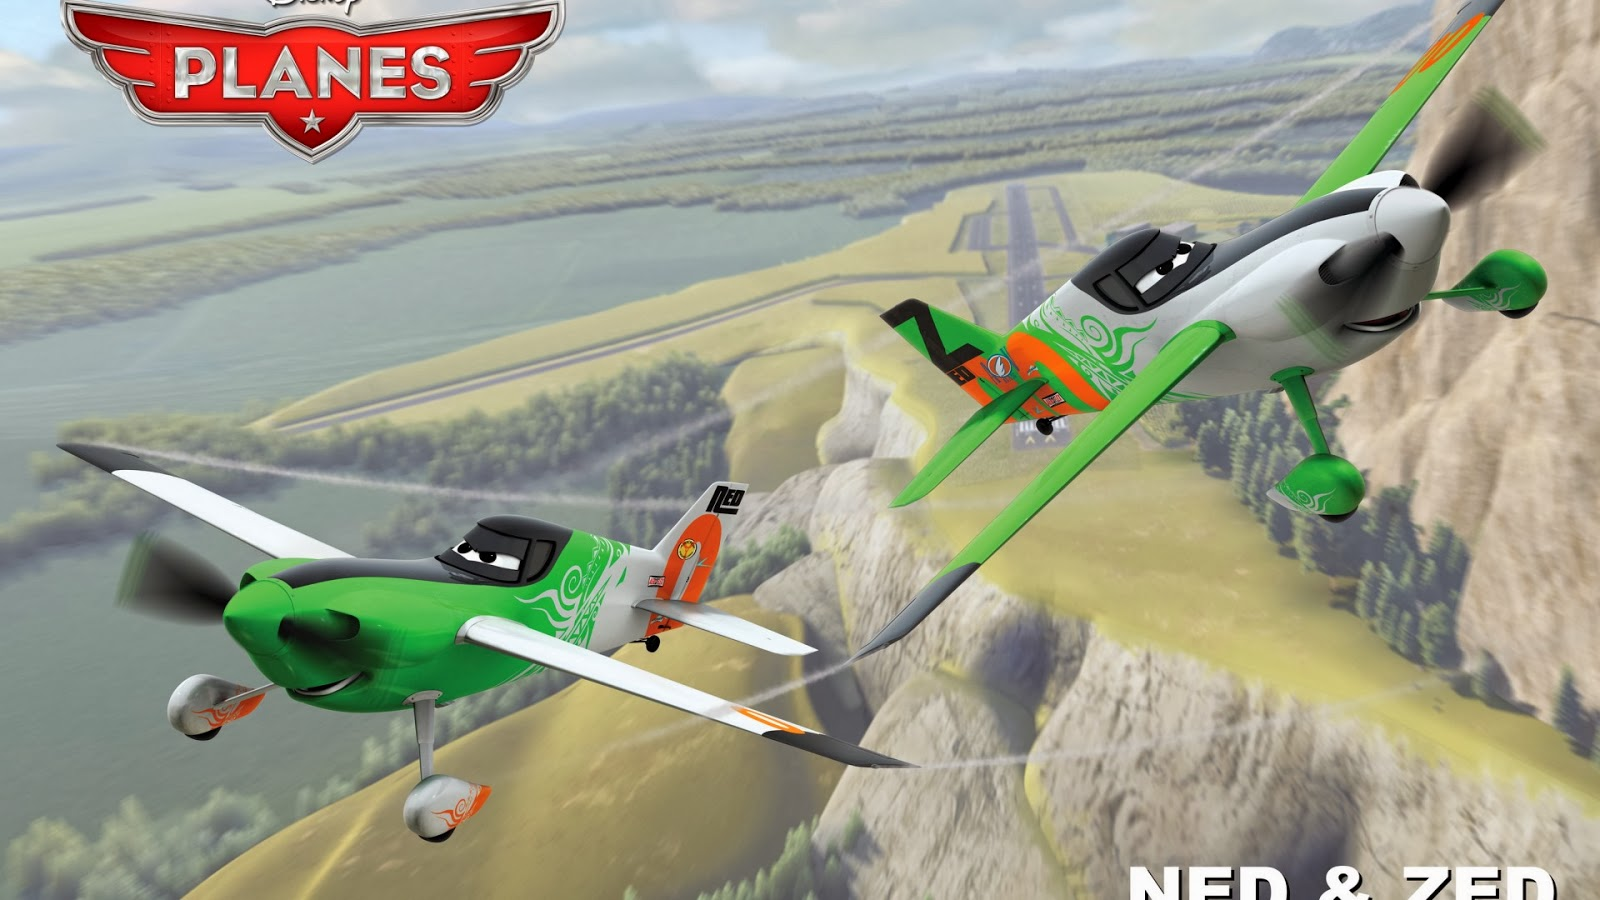 disney planes movie wallpapers - photo #18